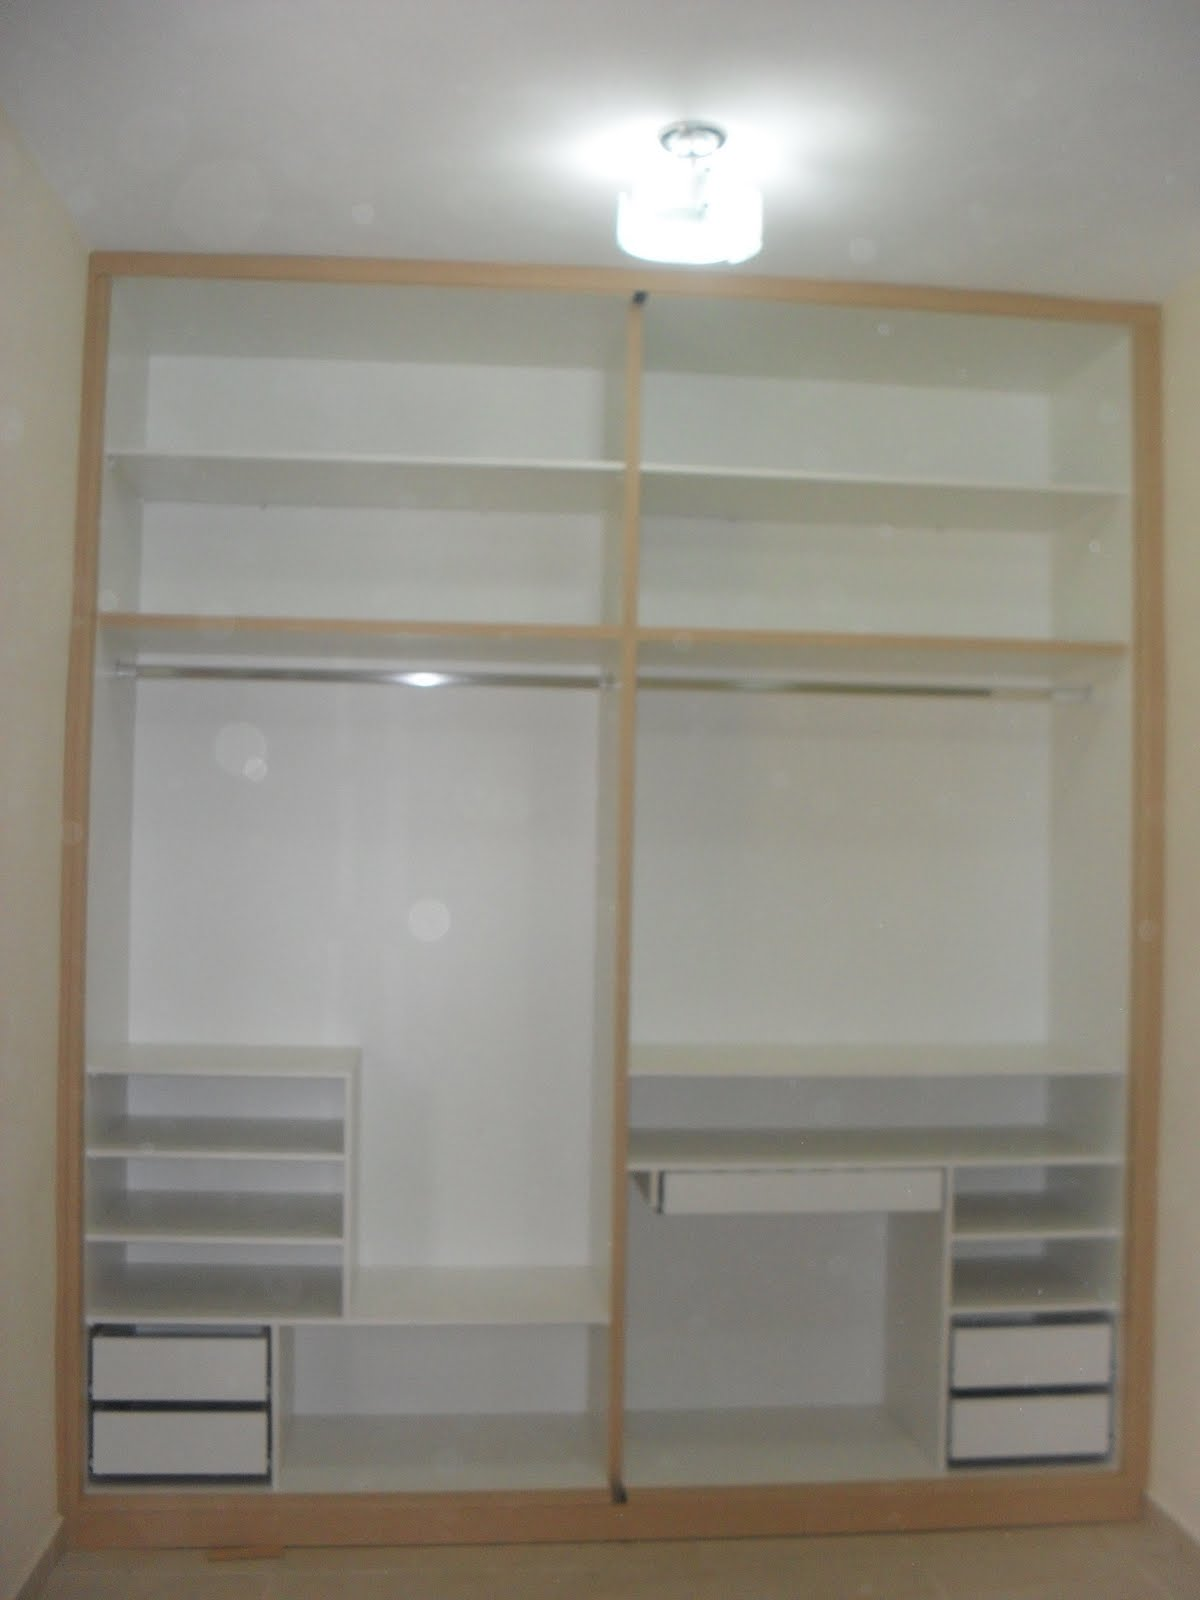 Com Cama Embutida Multidecor Branco Multimoveis Car Interior Design #695139 1200 1600